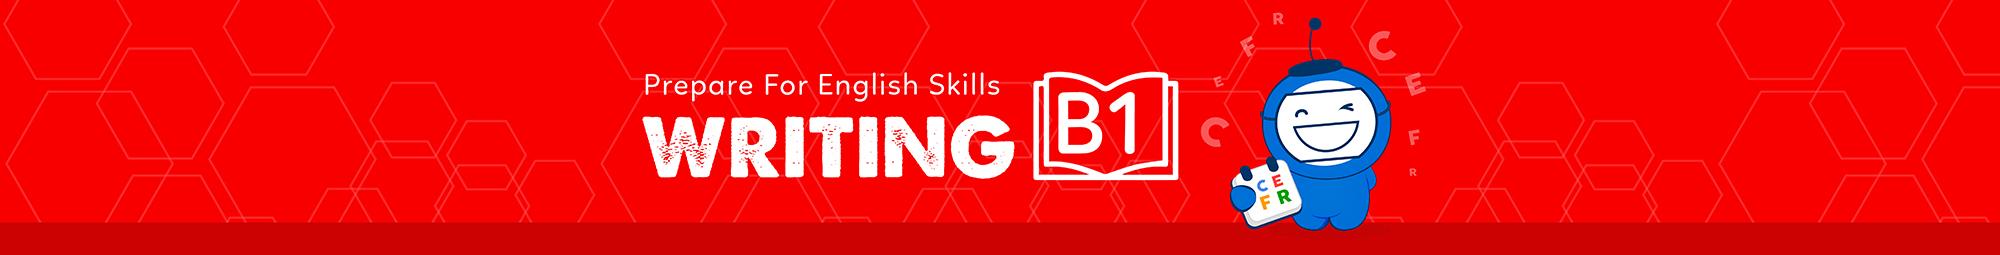 Prepare for Writing Skill (B1) banner